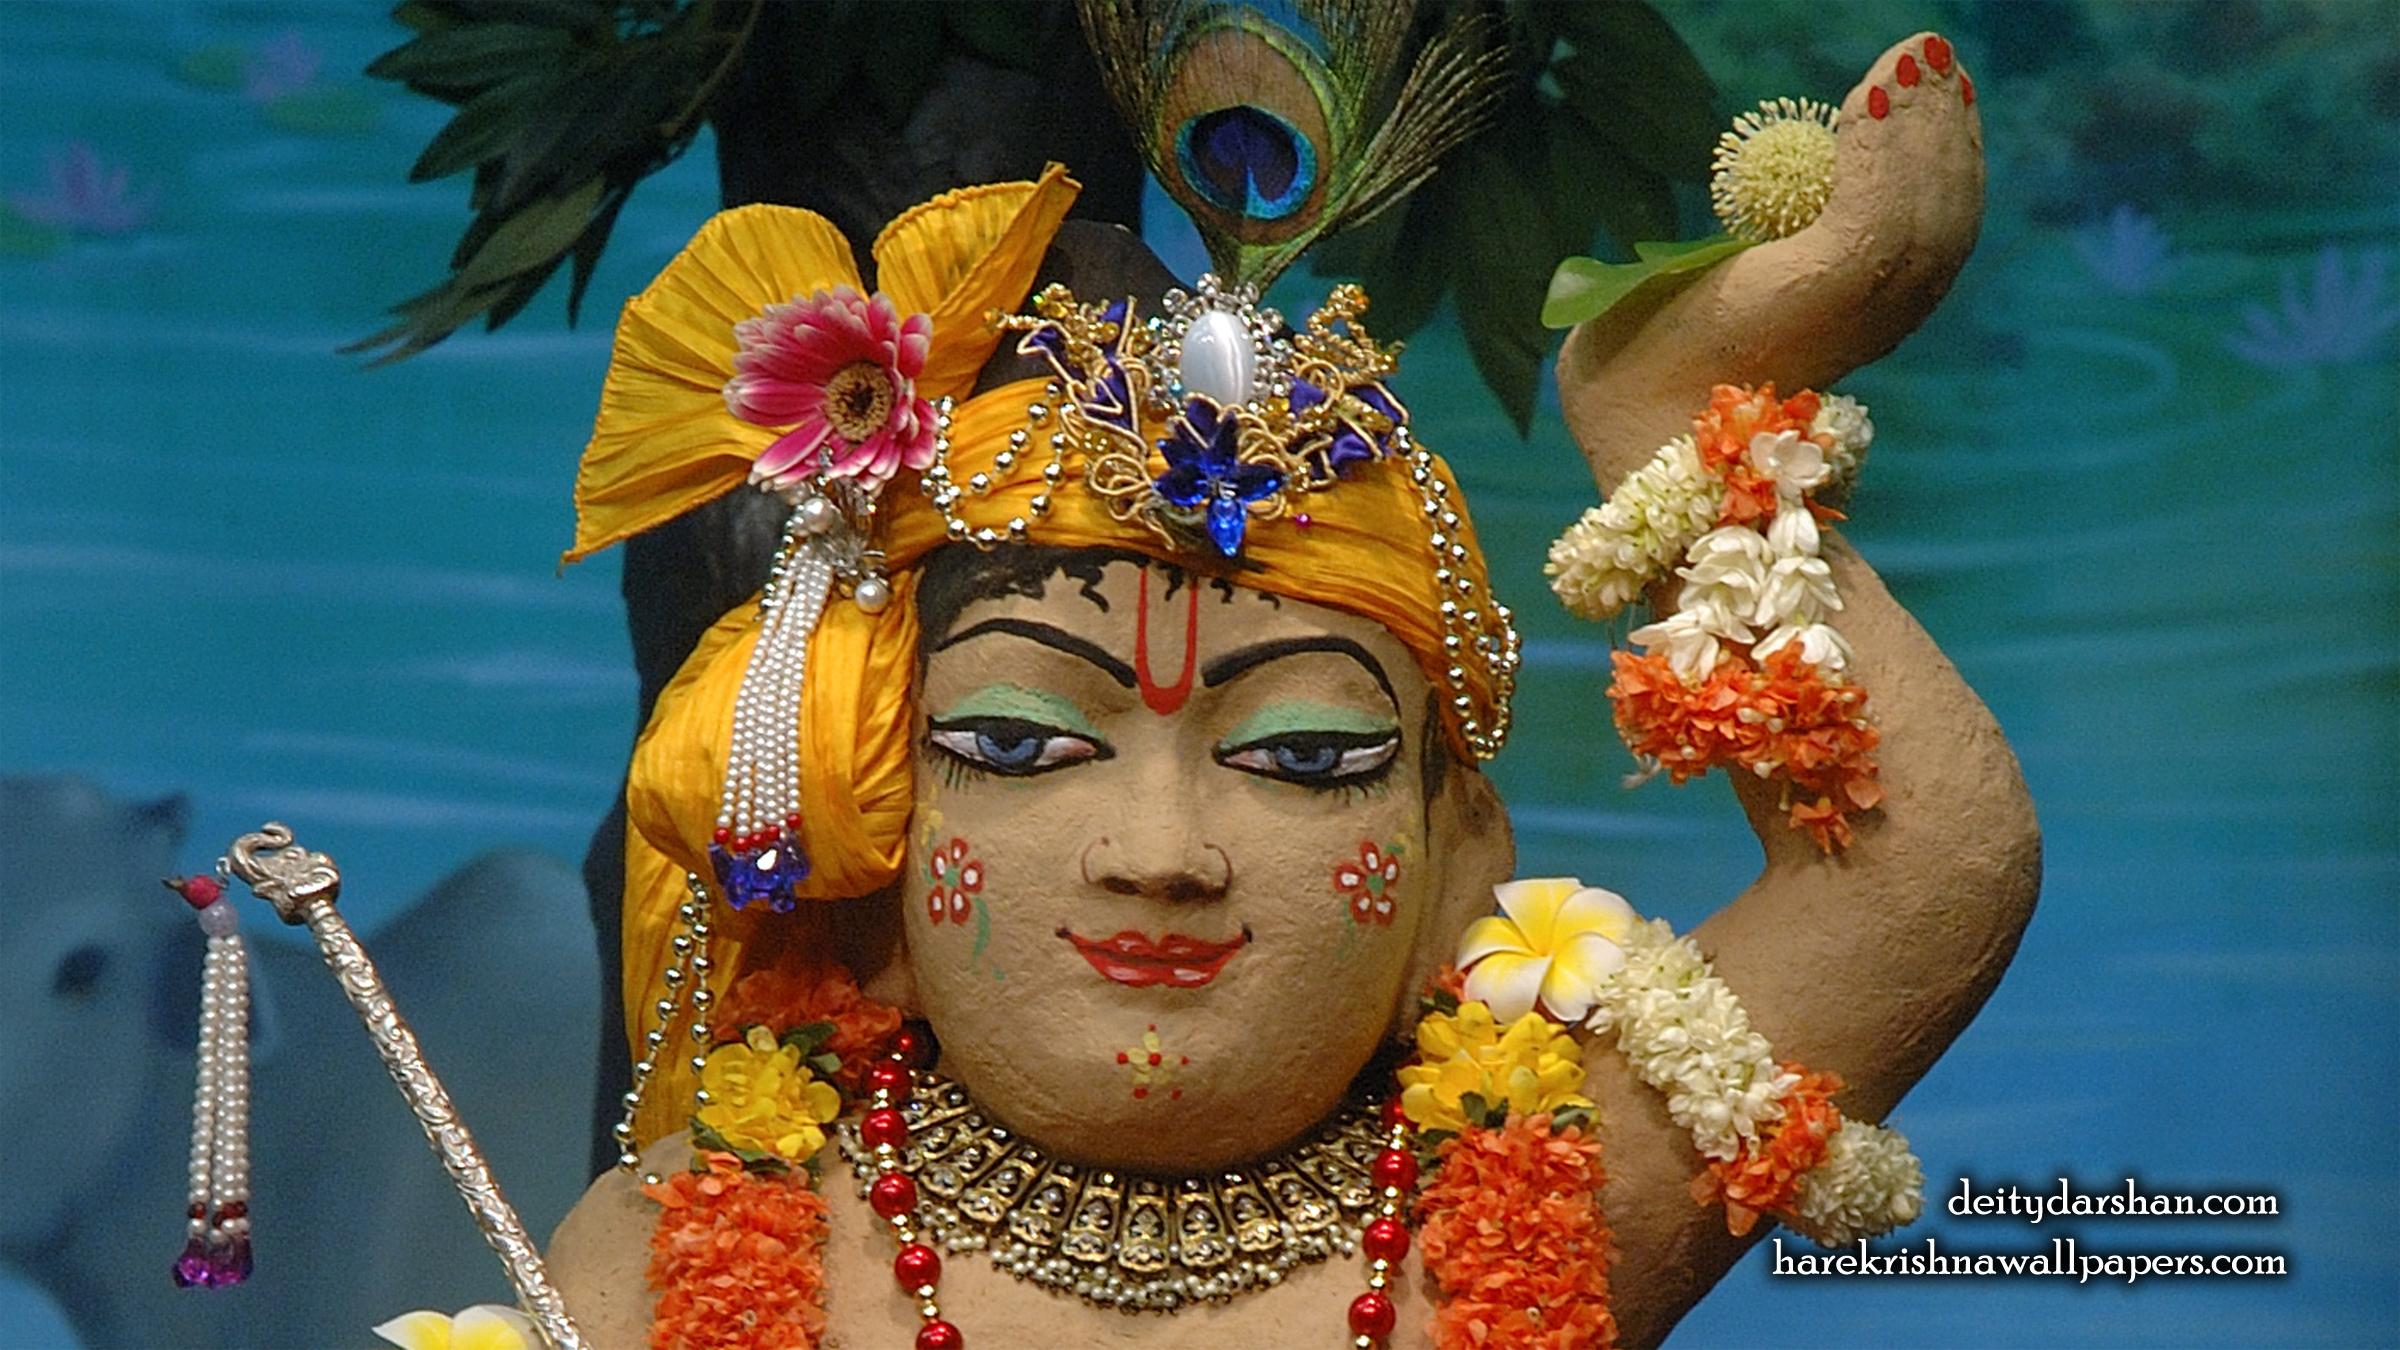 Sri Gopal Close up Wallpaper (039) Size 2400x1350 Download